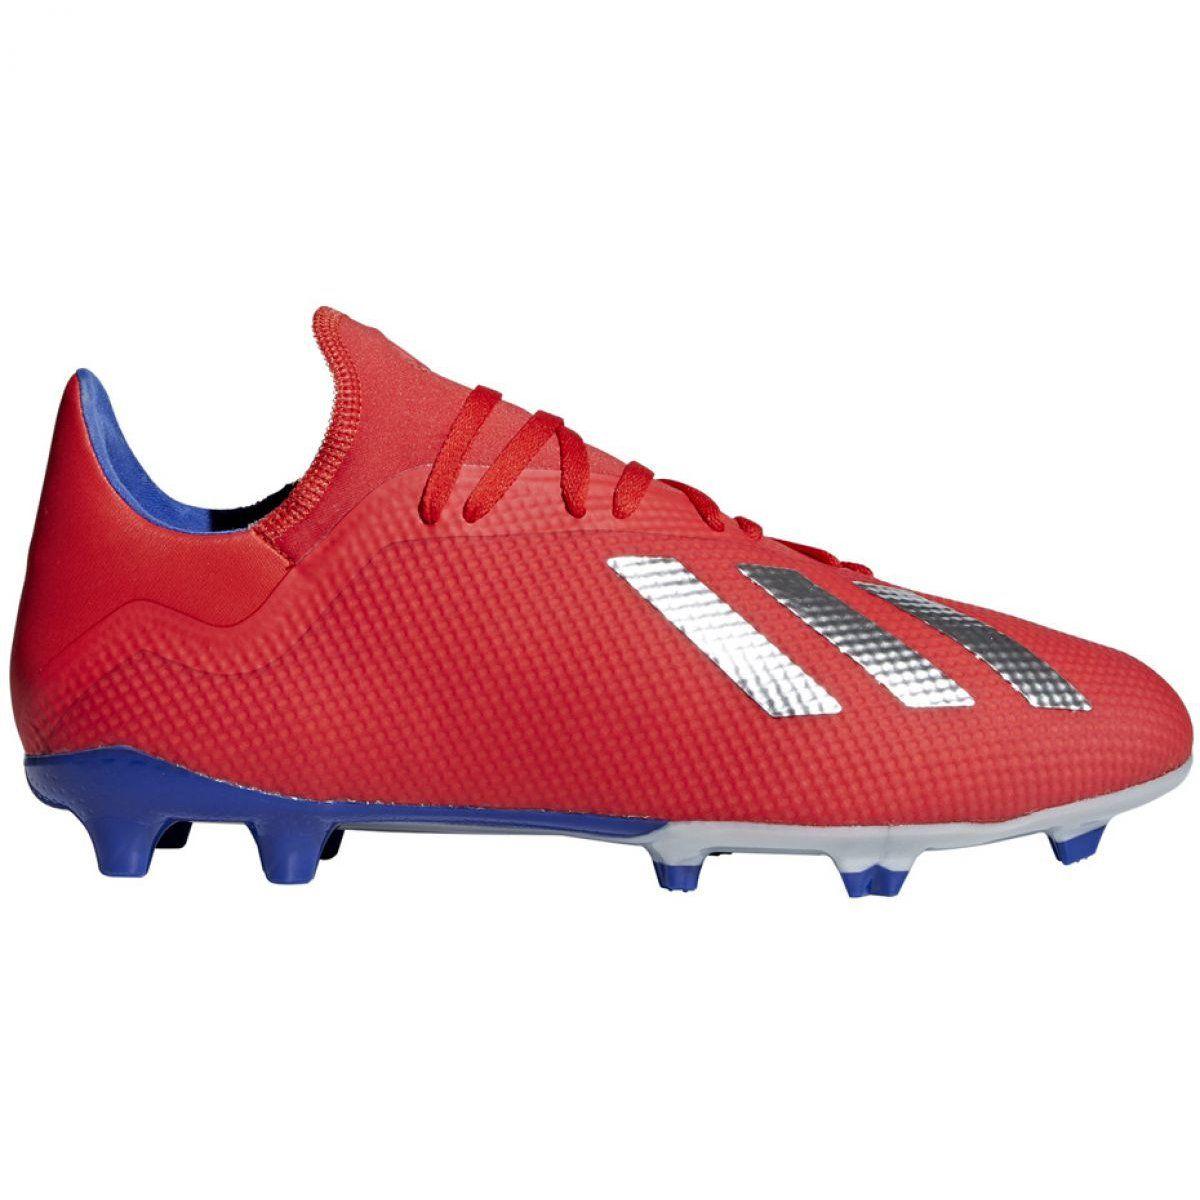 Buty Pilkarskie Adidas X 18 3 Fg M Bb9367 Czerwone Wielokolorowe Adidas Men Football Shoes Adidas Outfit Shoes